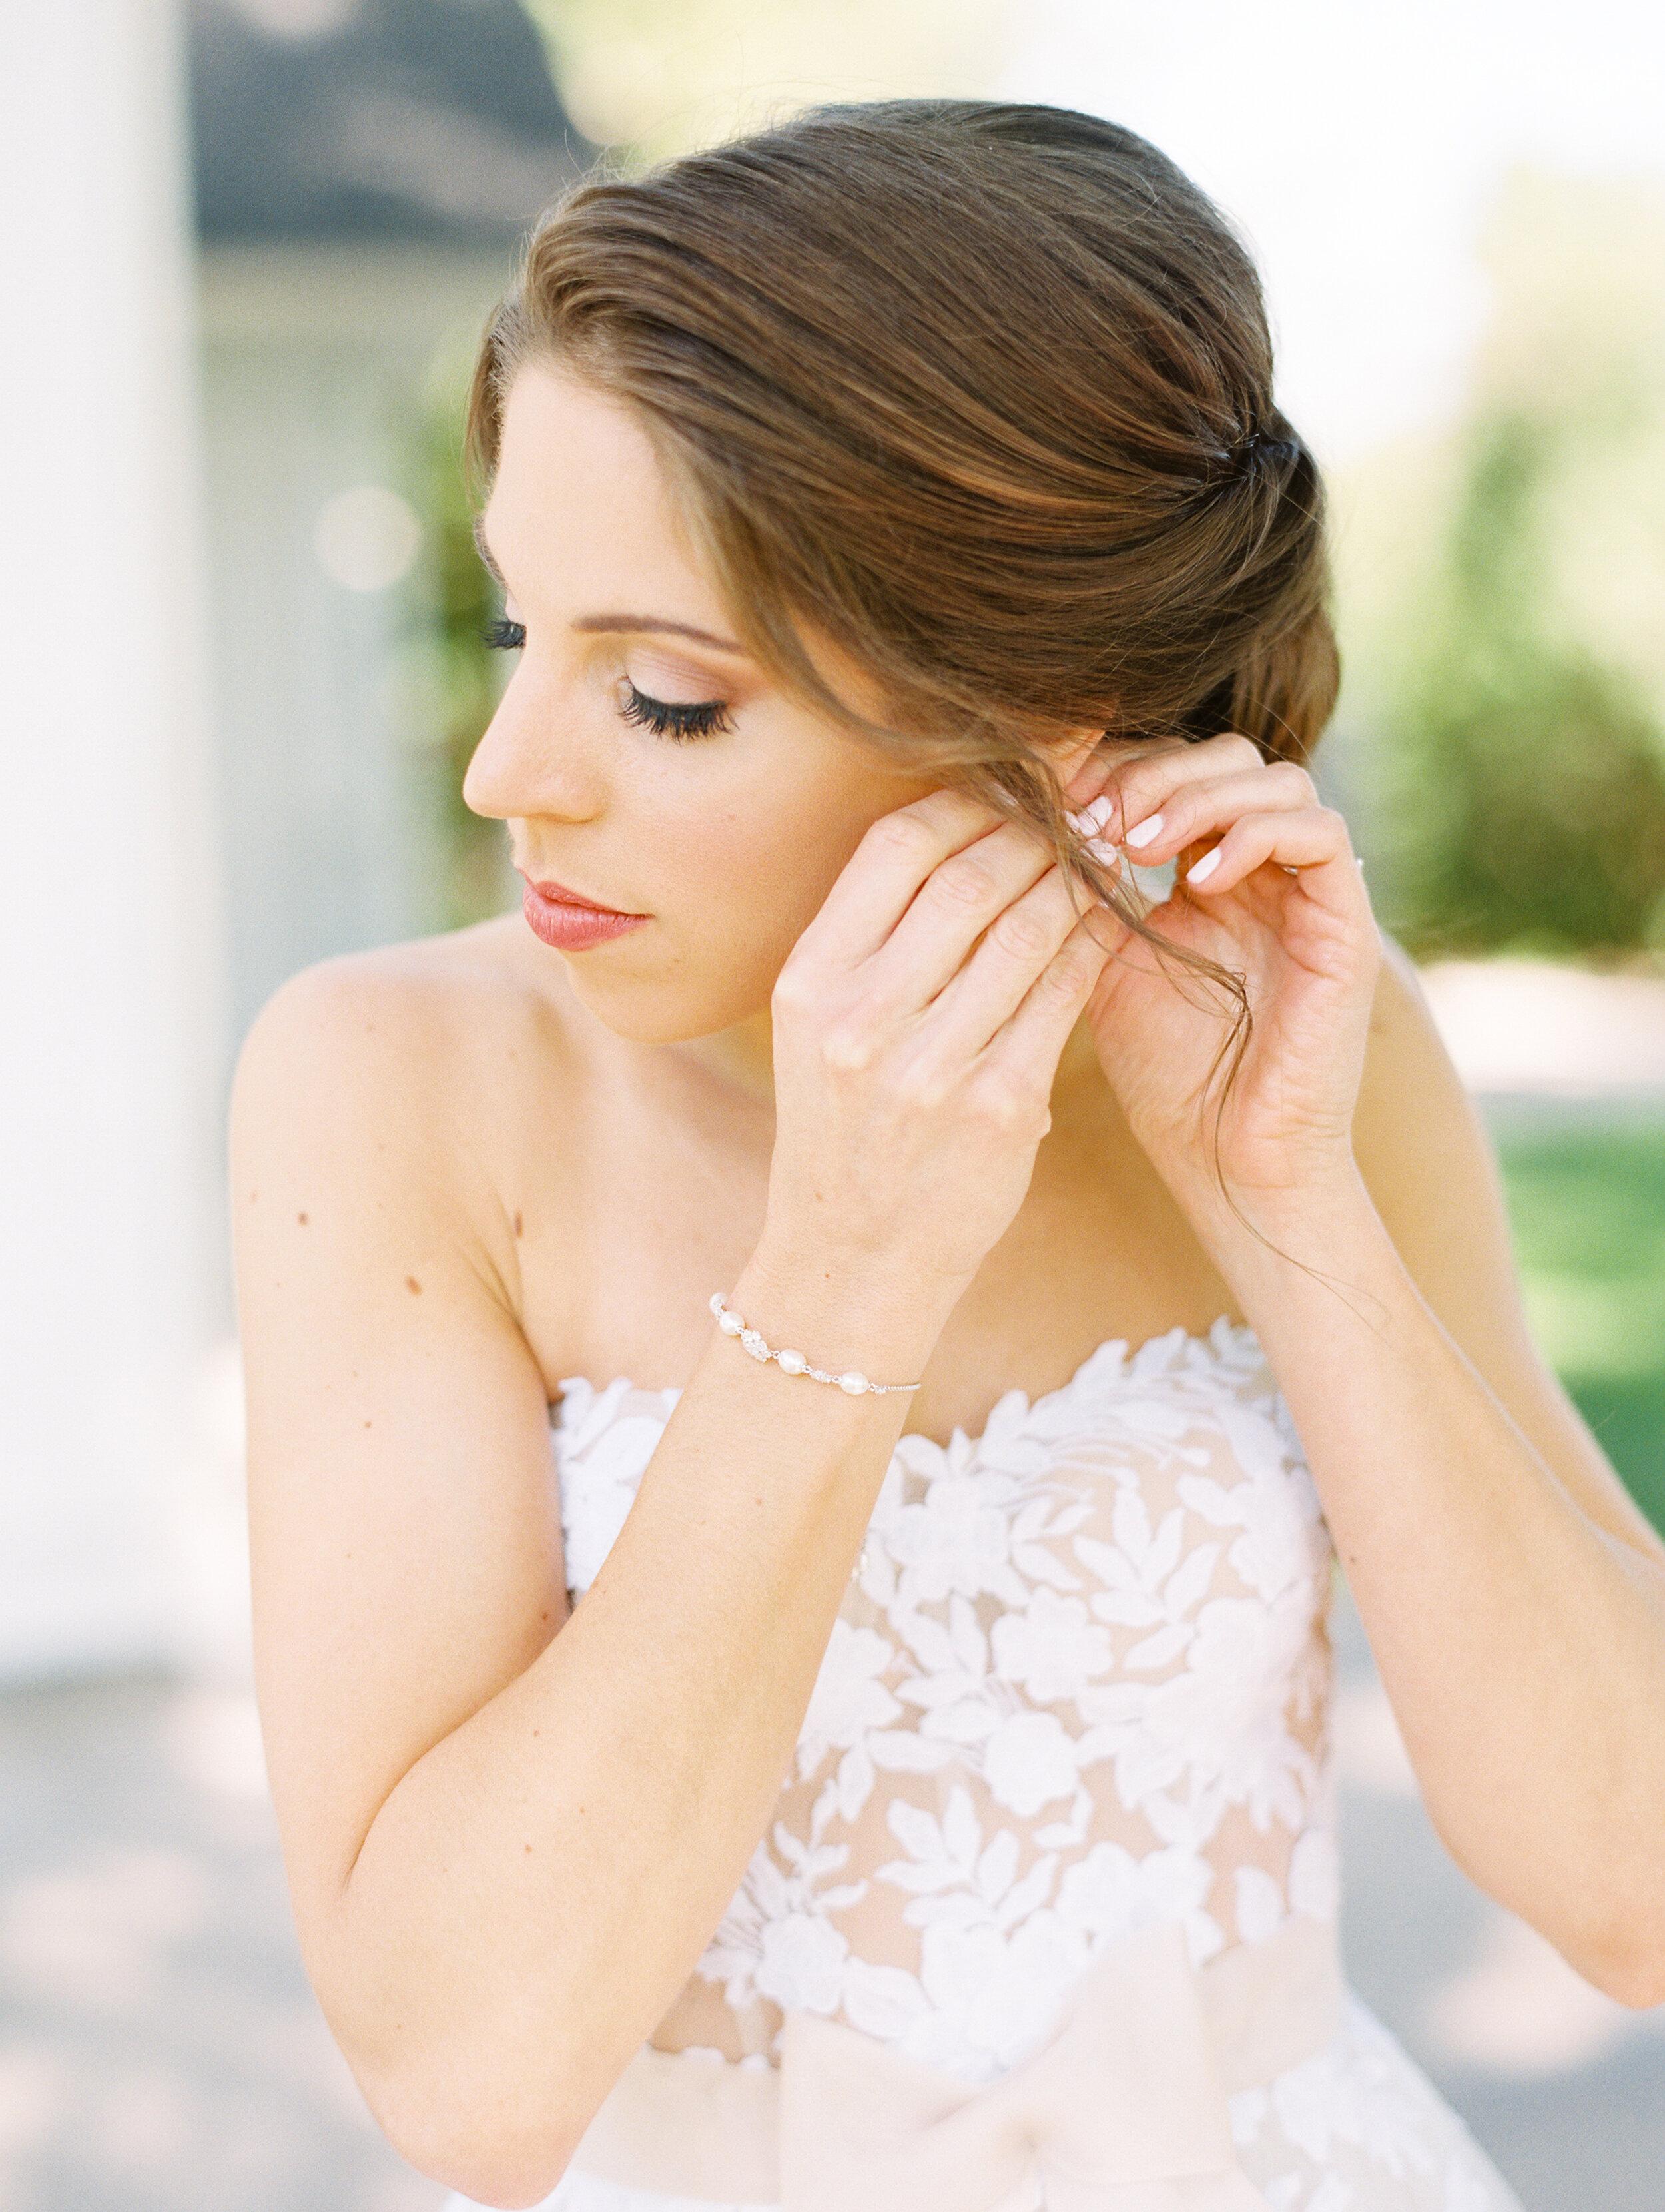 Steinlage+Wedding+Getting+Ready-104.jpg